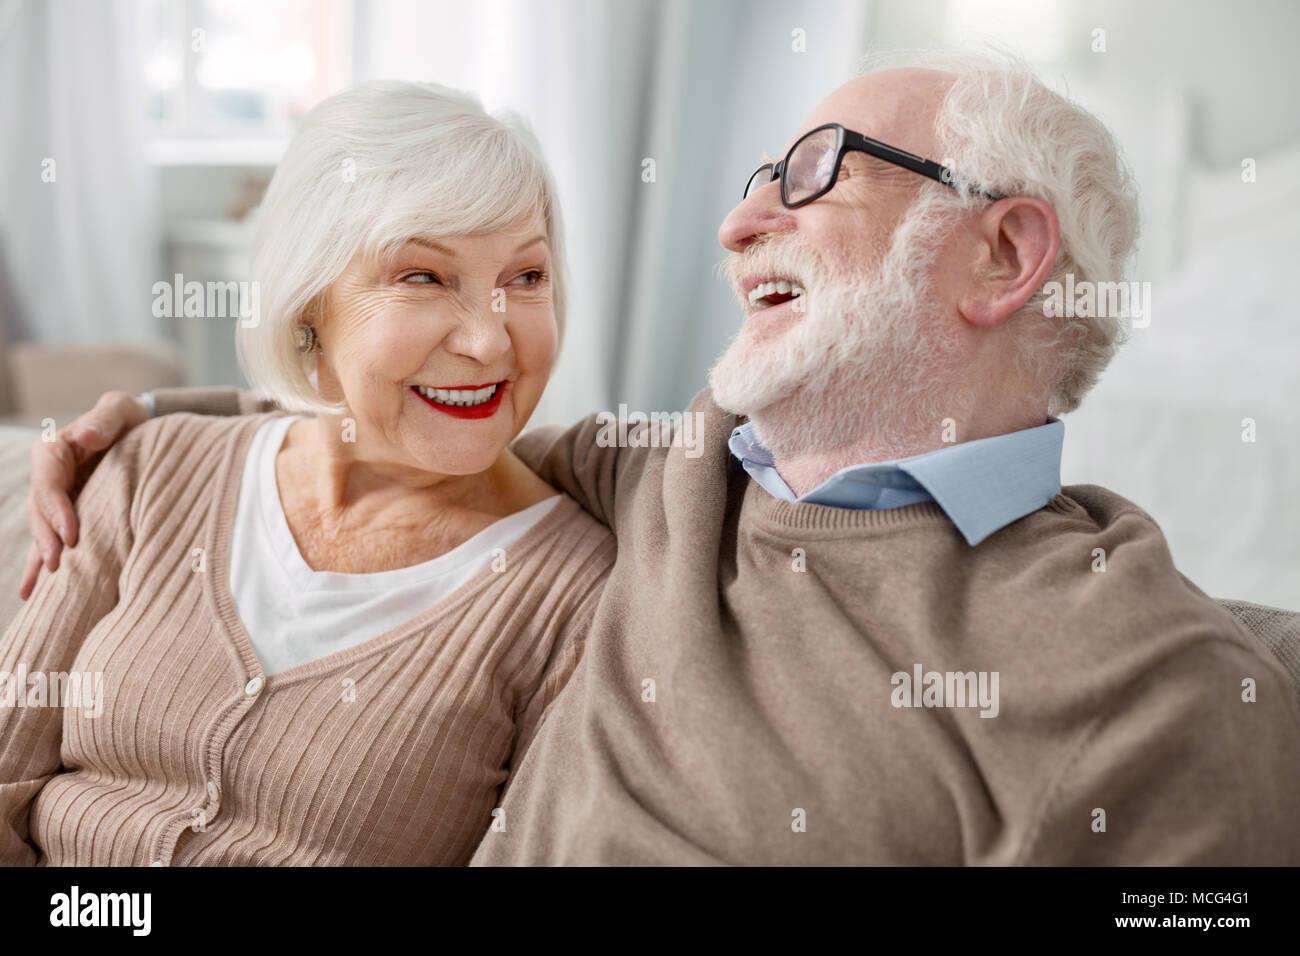 Fröhlicher älterer Mann seine Frau umarmt Stockfoto